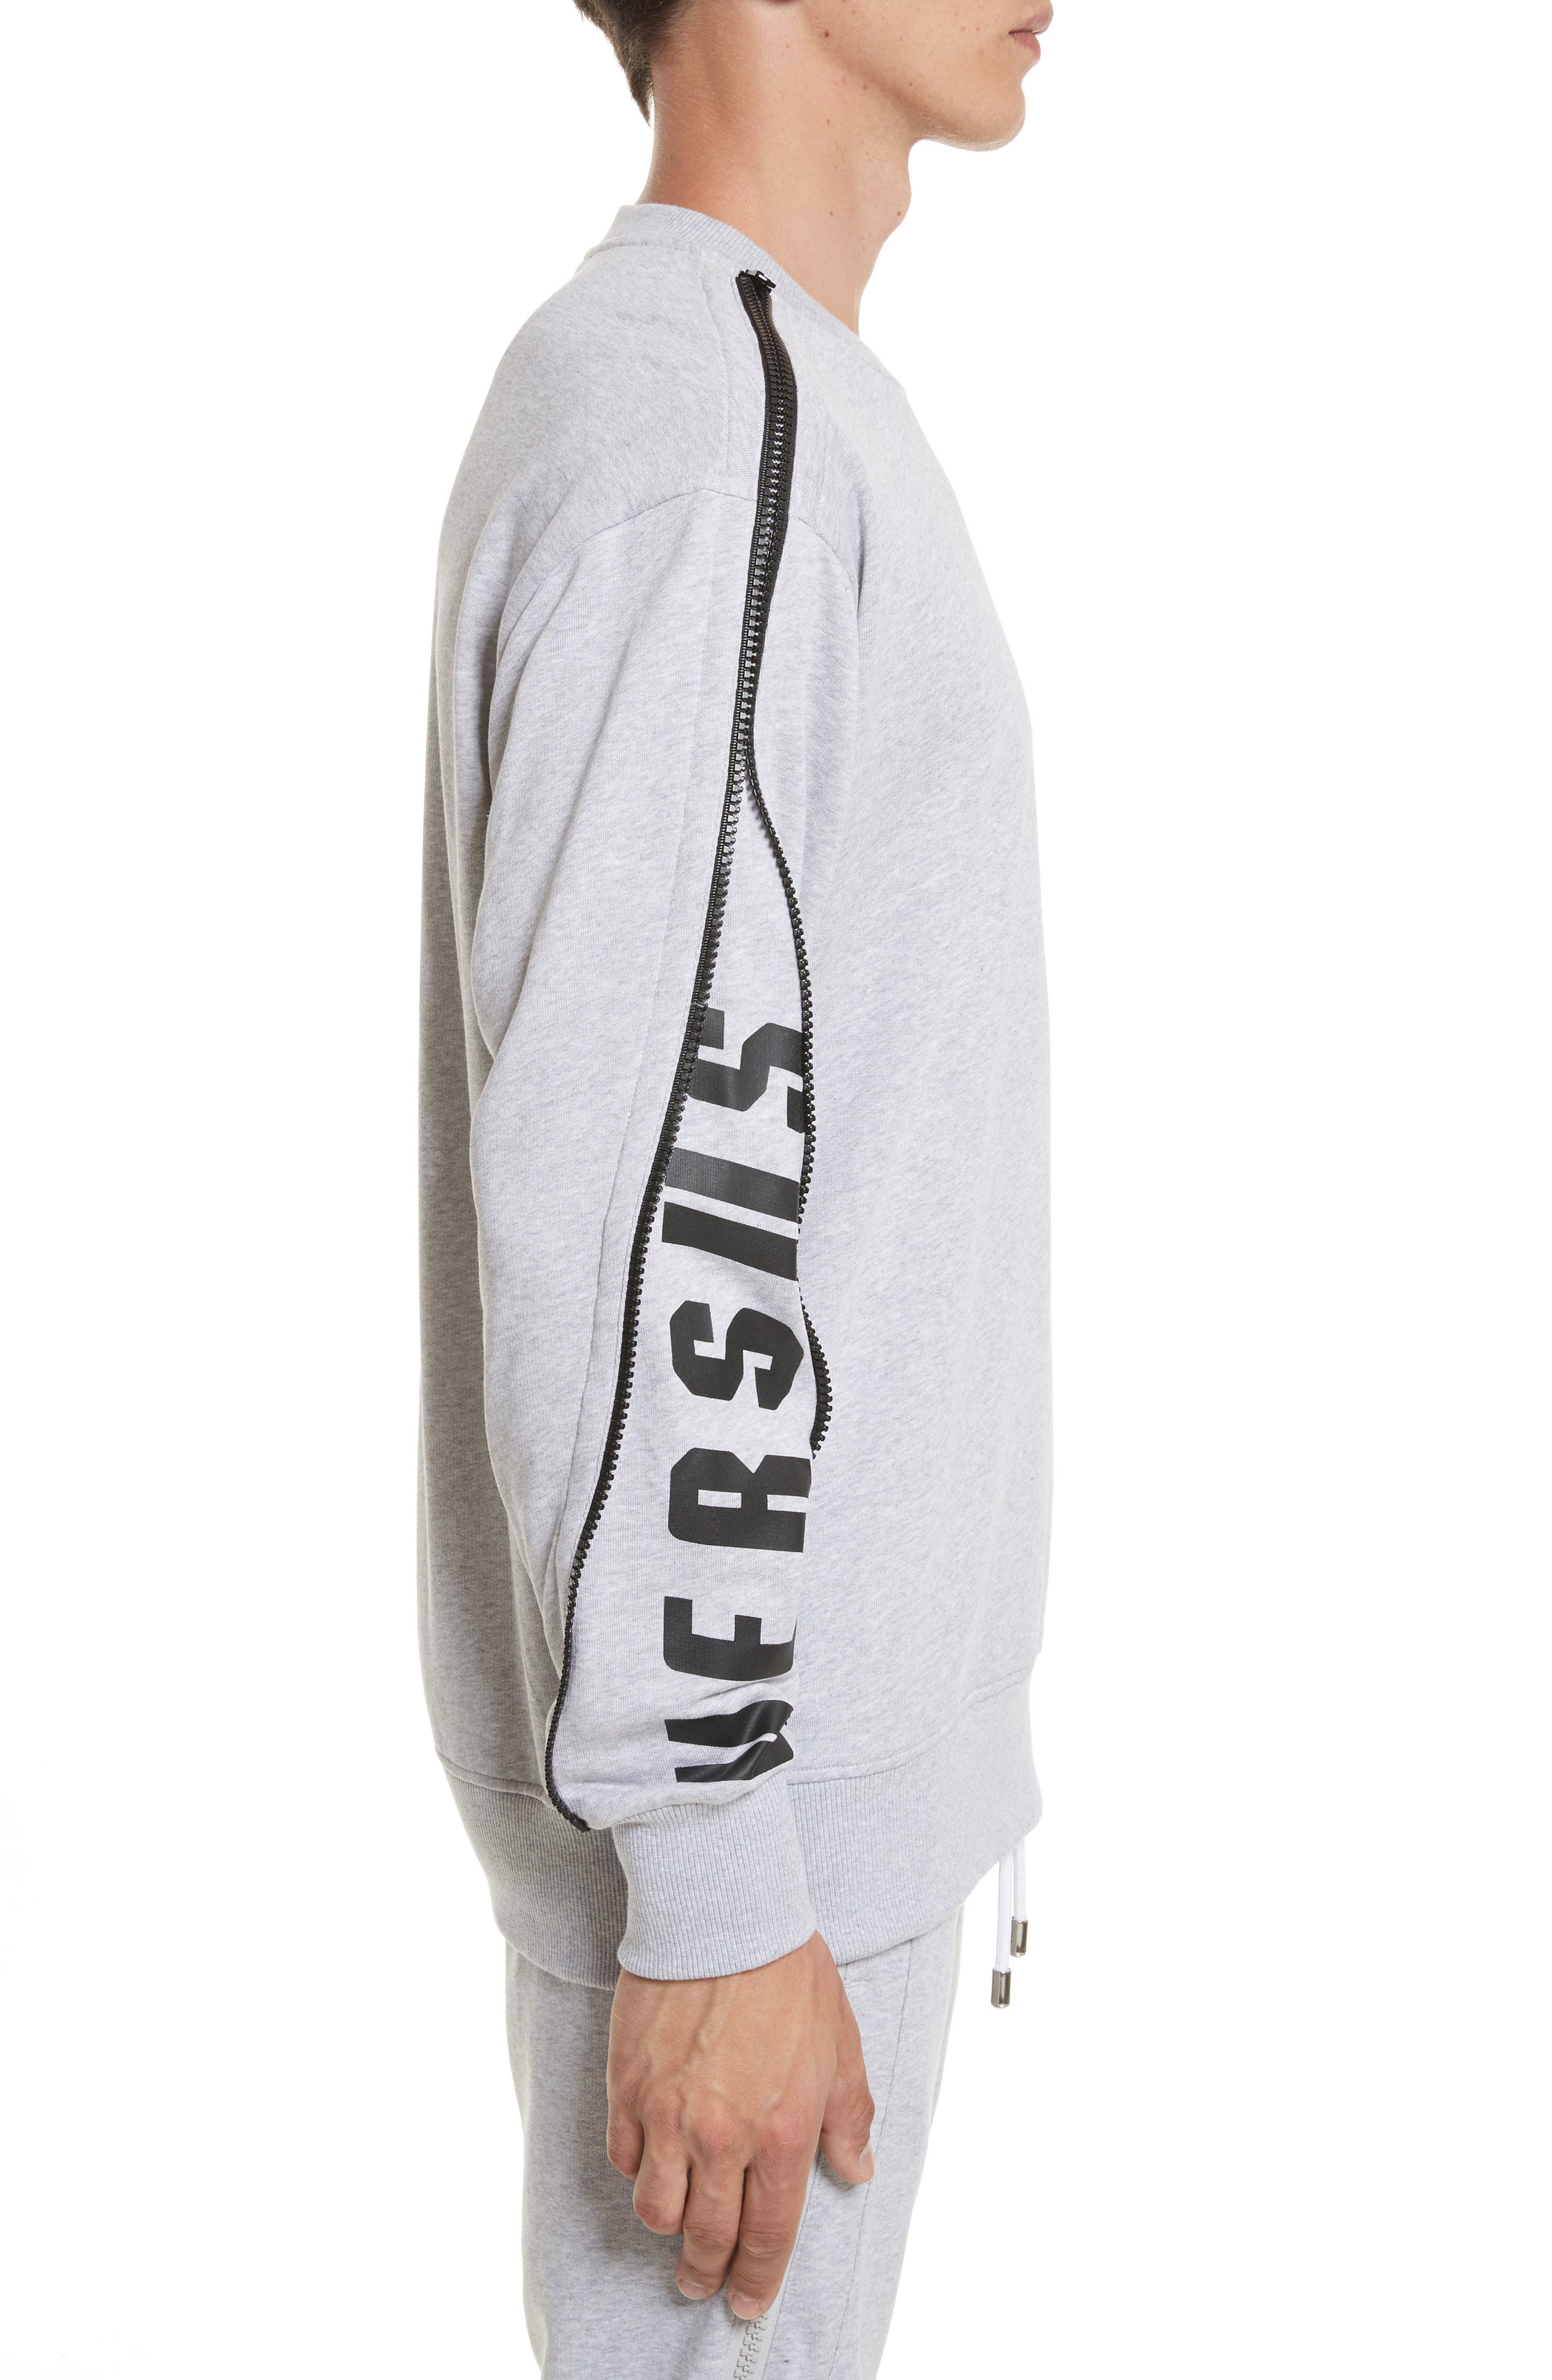 VERSUS by Versace Zip Sleeve Crewneck Sweatshirt,                             Alternate thumbnail 3, color,                             Grey